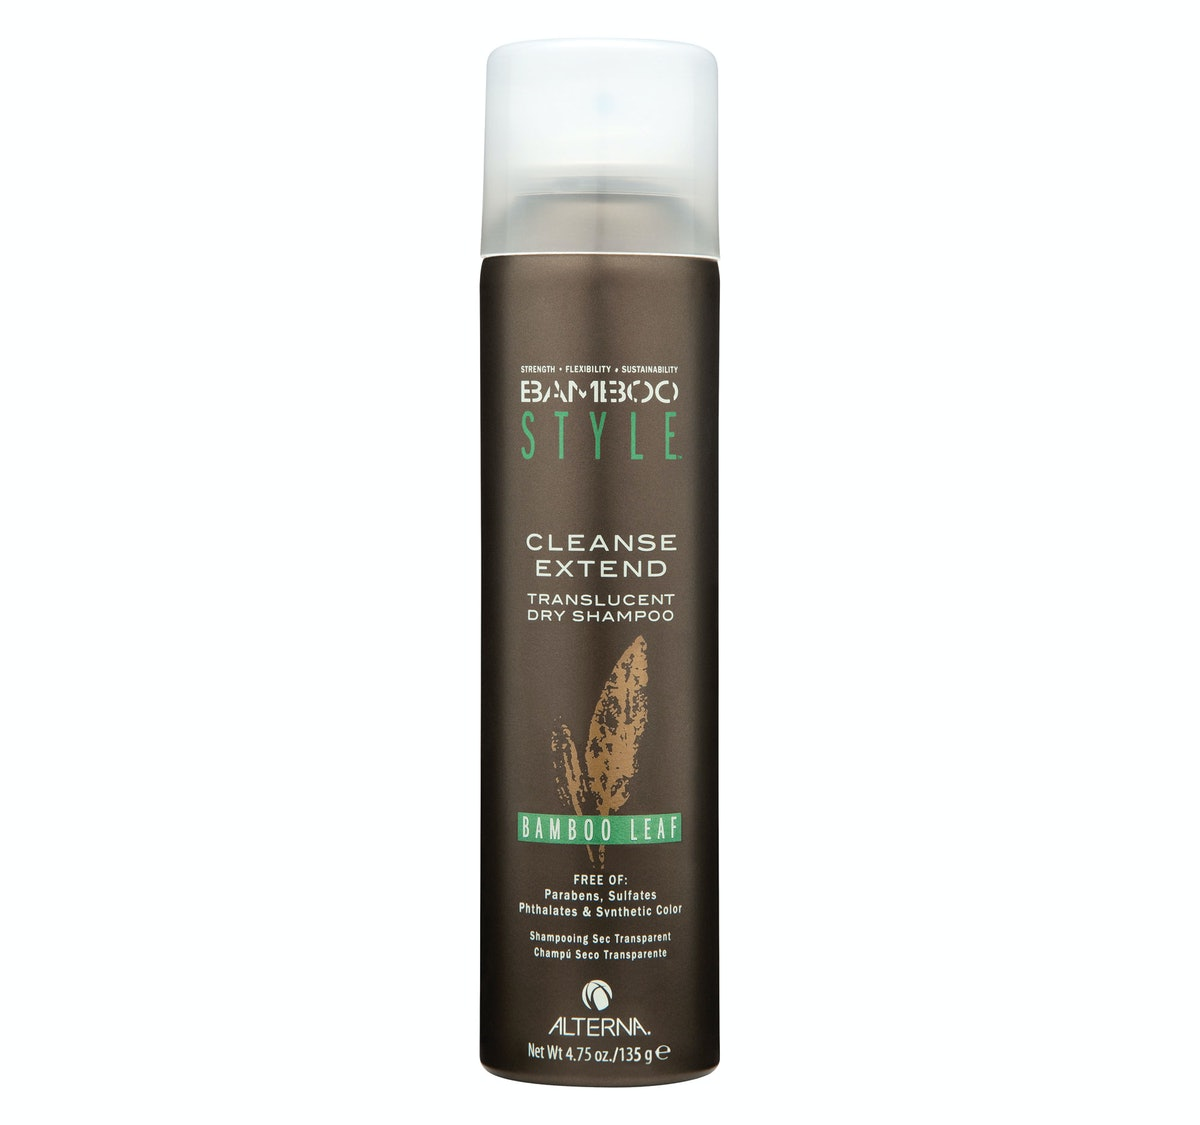 Alterna Cleanse Extend Translucent Dry Shampoo